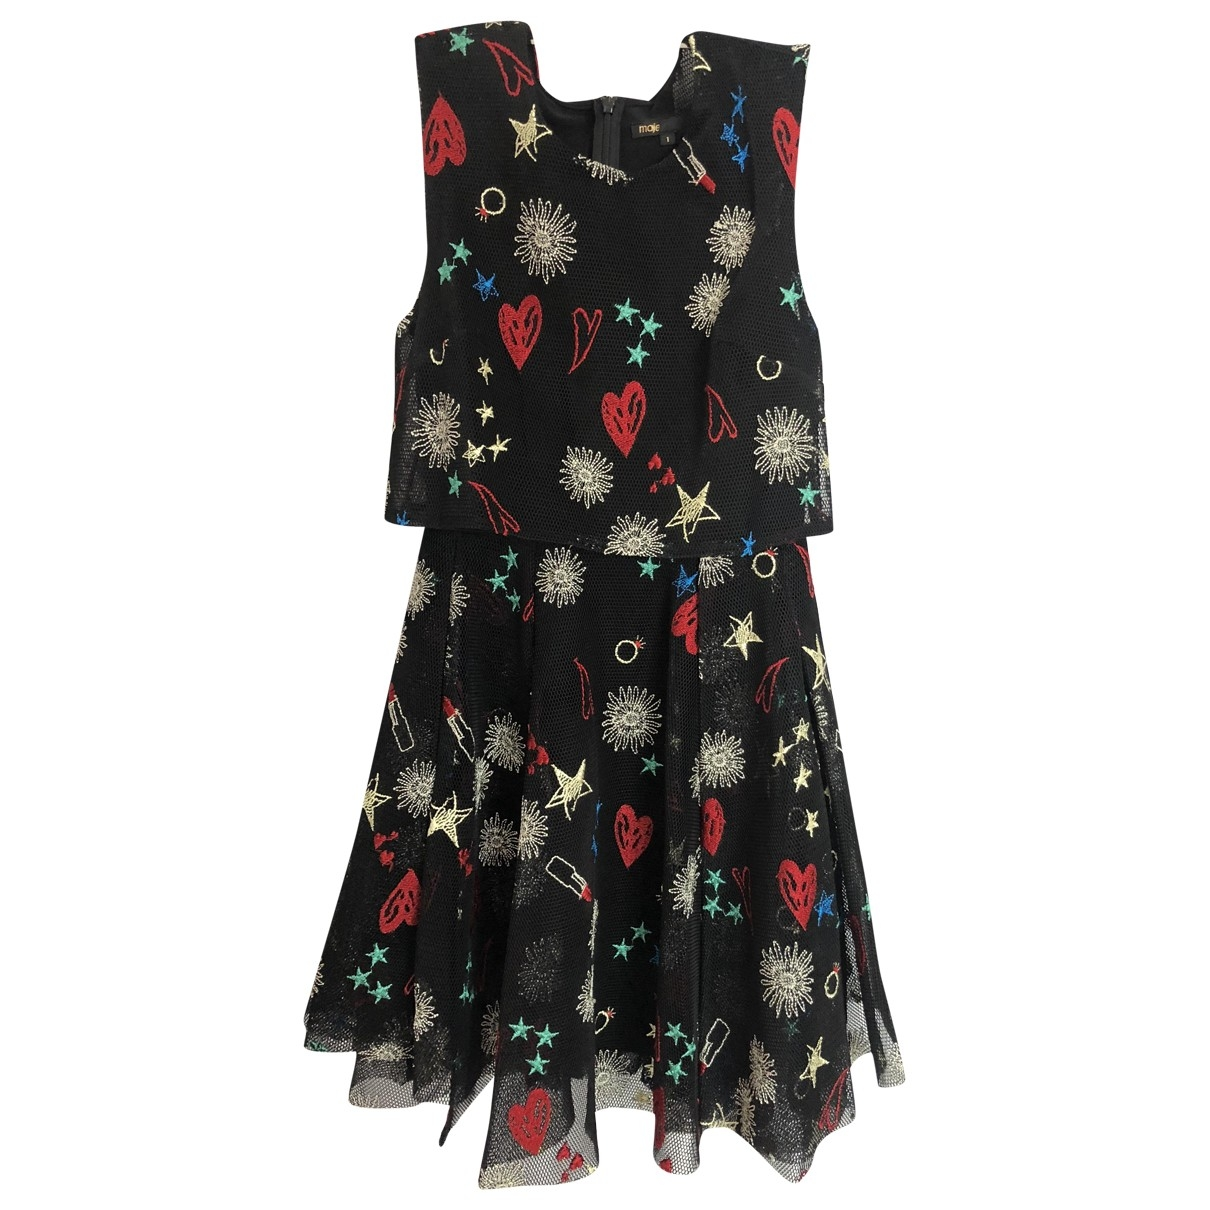 Maje \N Multicolour dress for Women 1 US